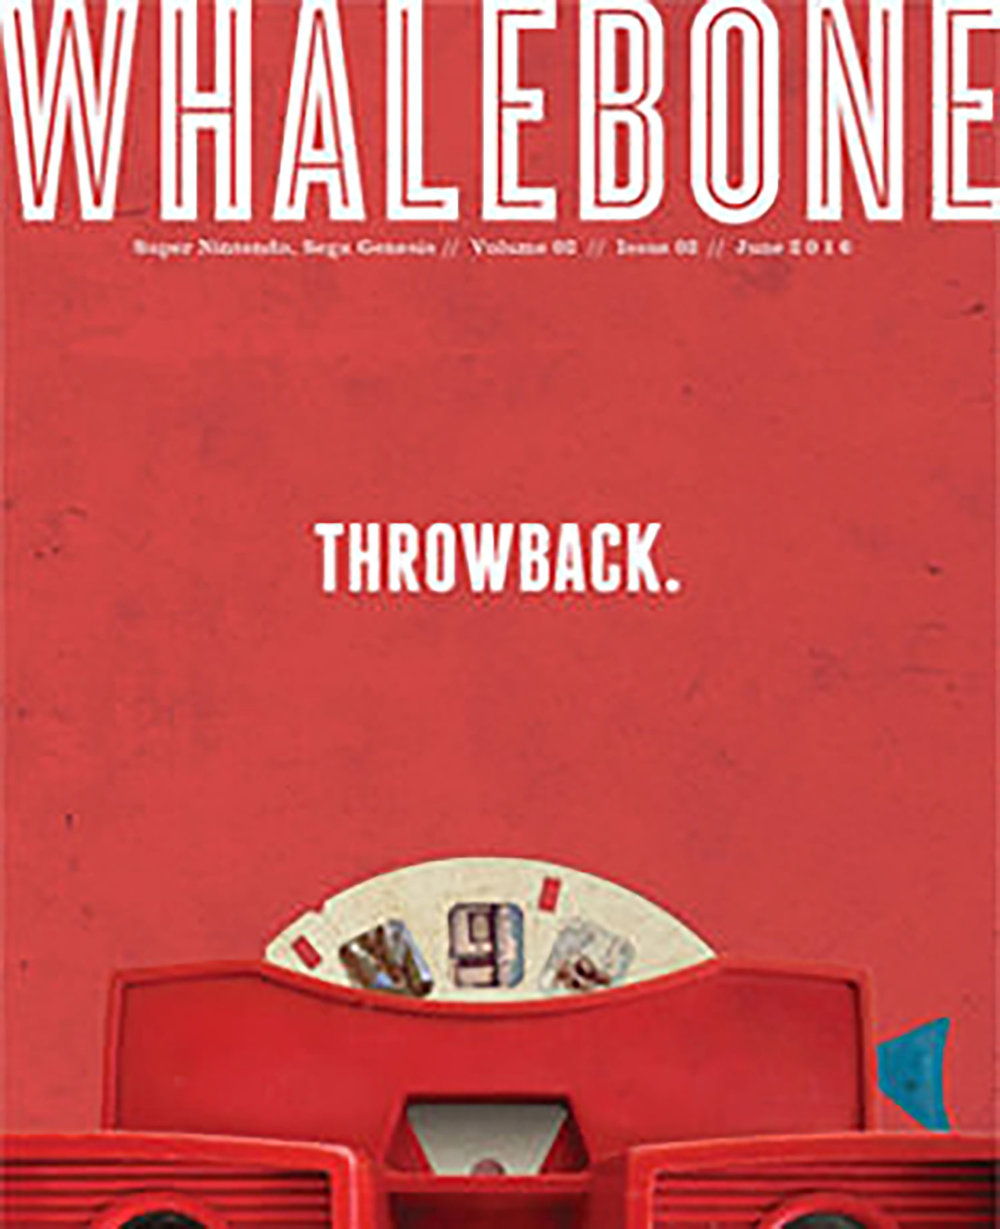 Whalebone-Magazine-Montauk-Hamptons-Dexter-Lake-Club-Band.jpg